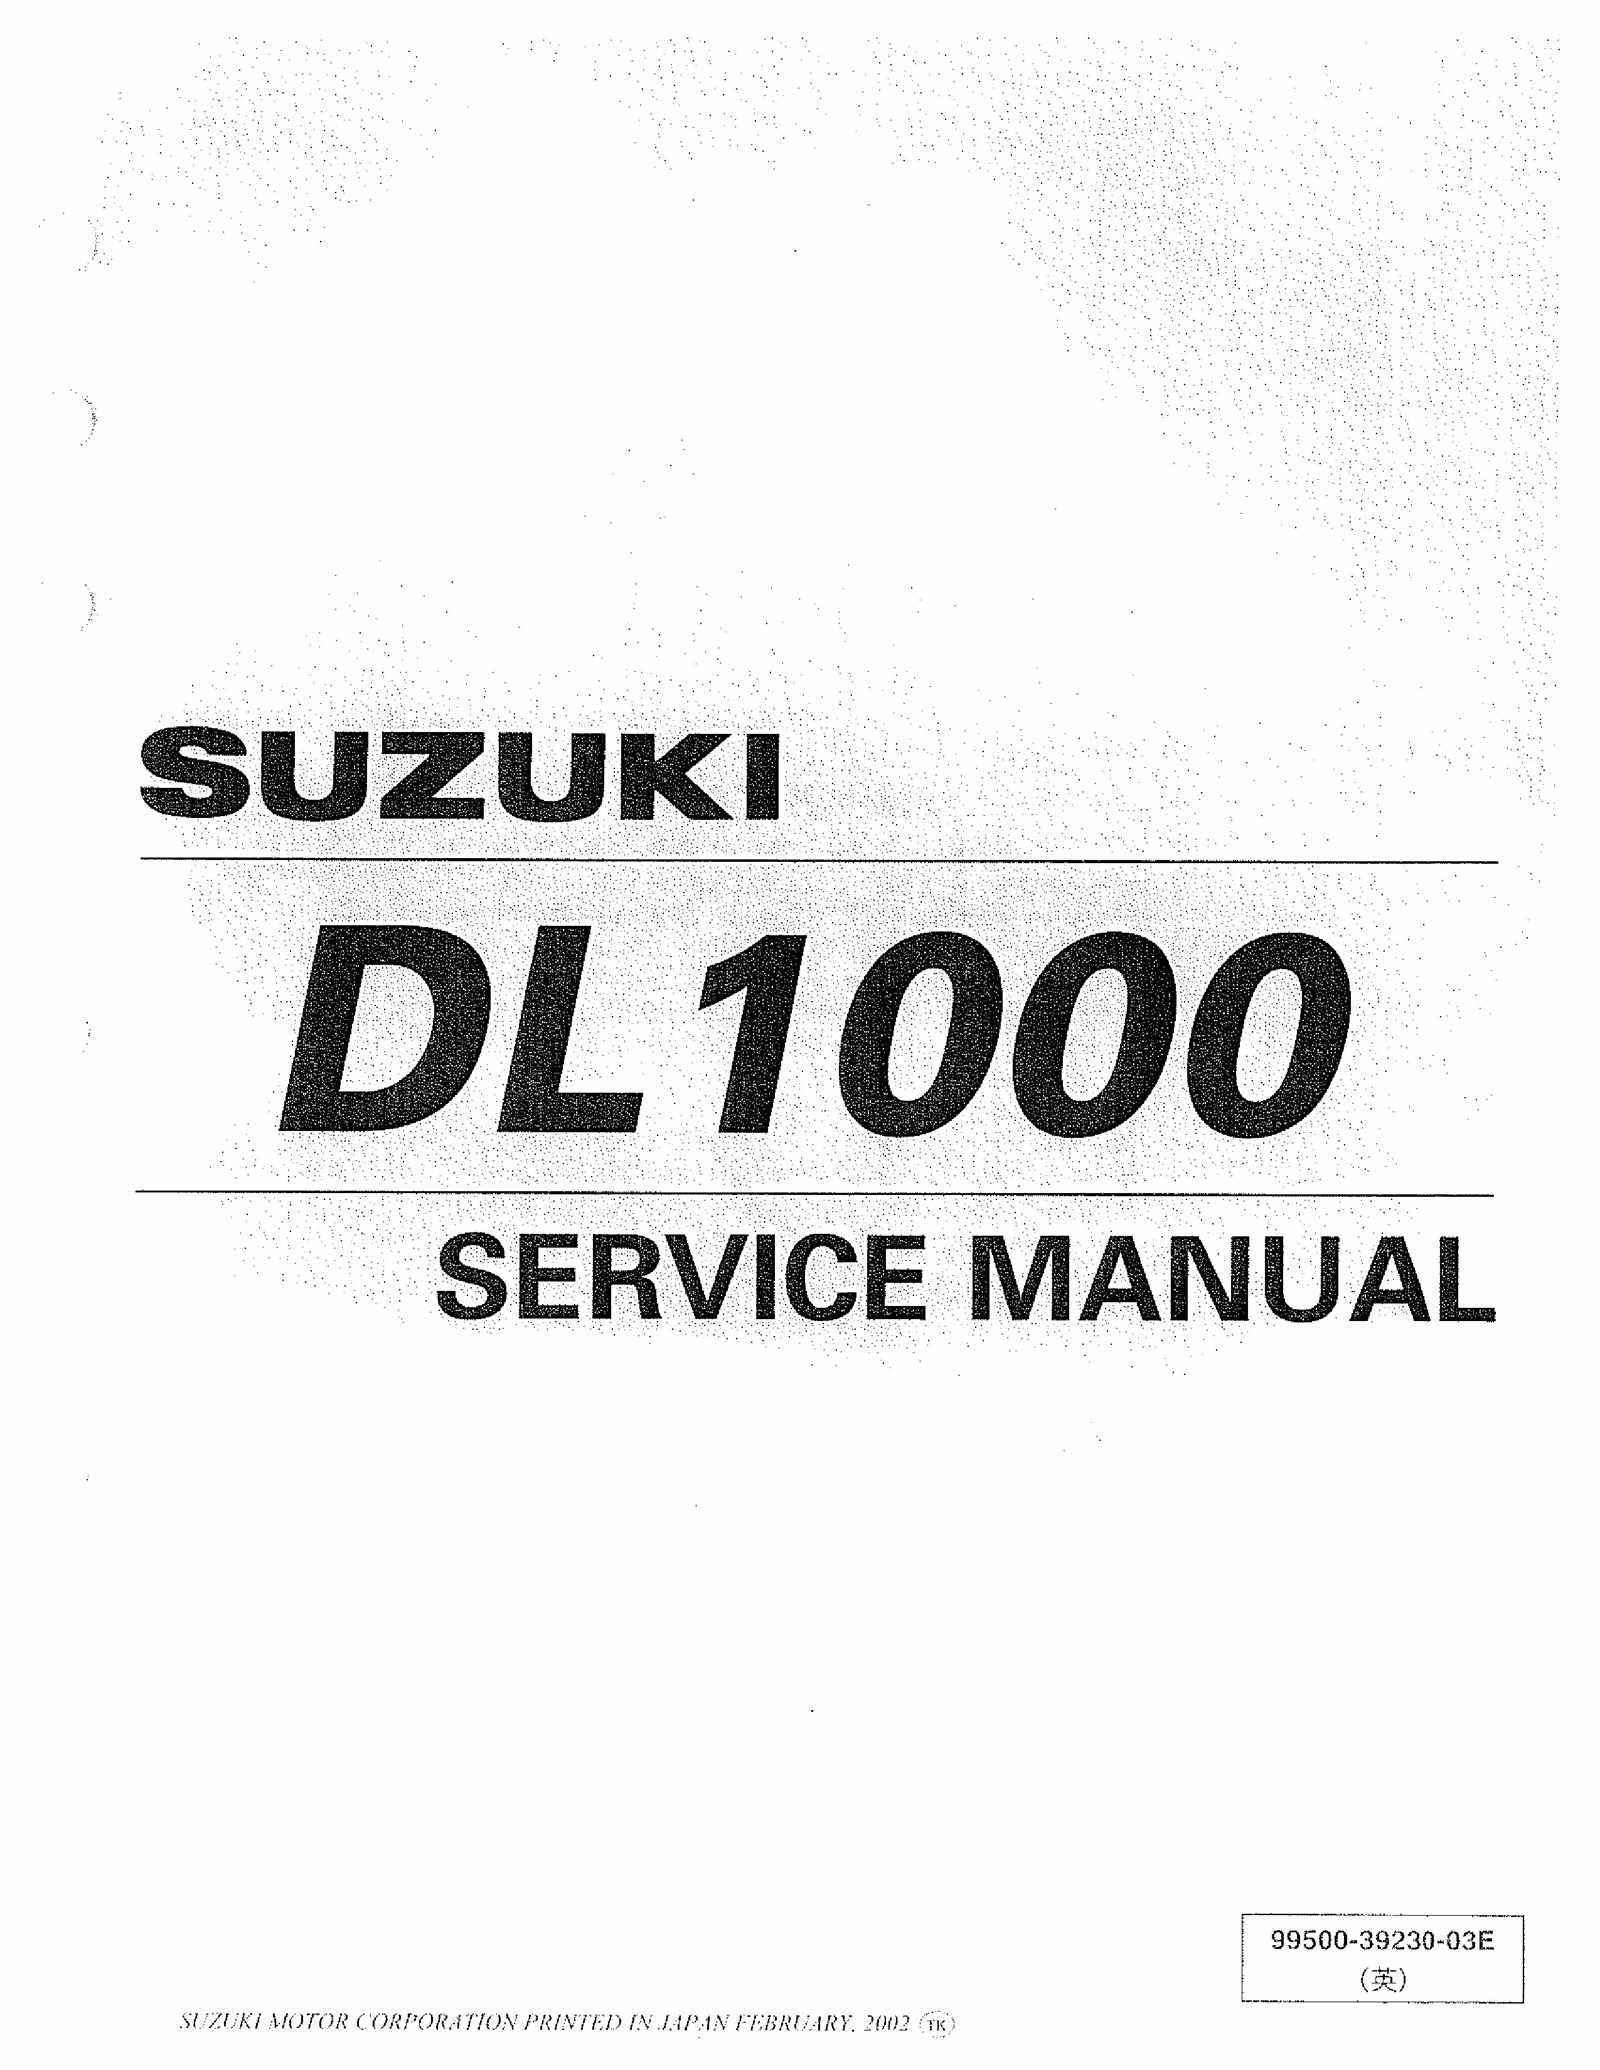 Suzuki DL1000 K2 Service Manual Free Download